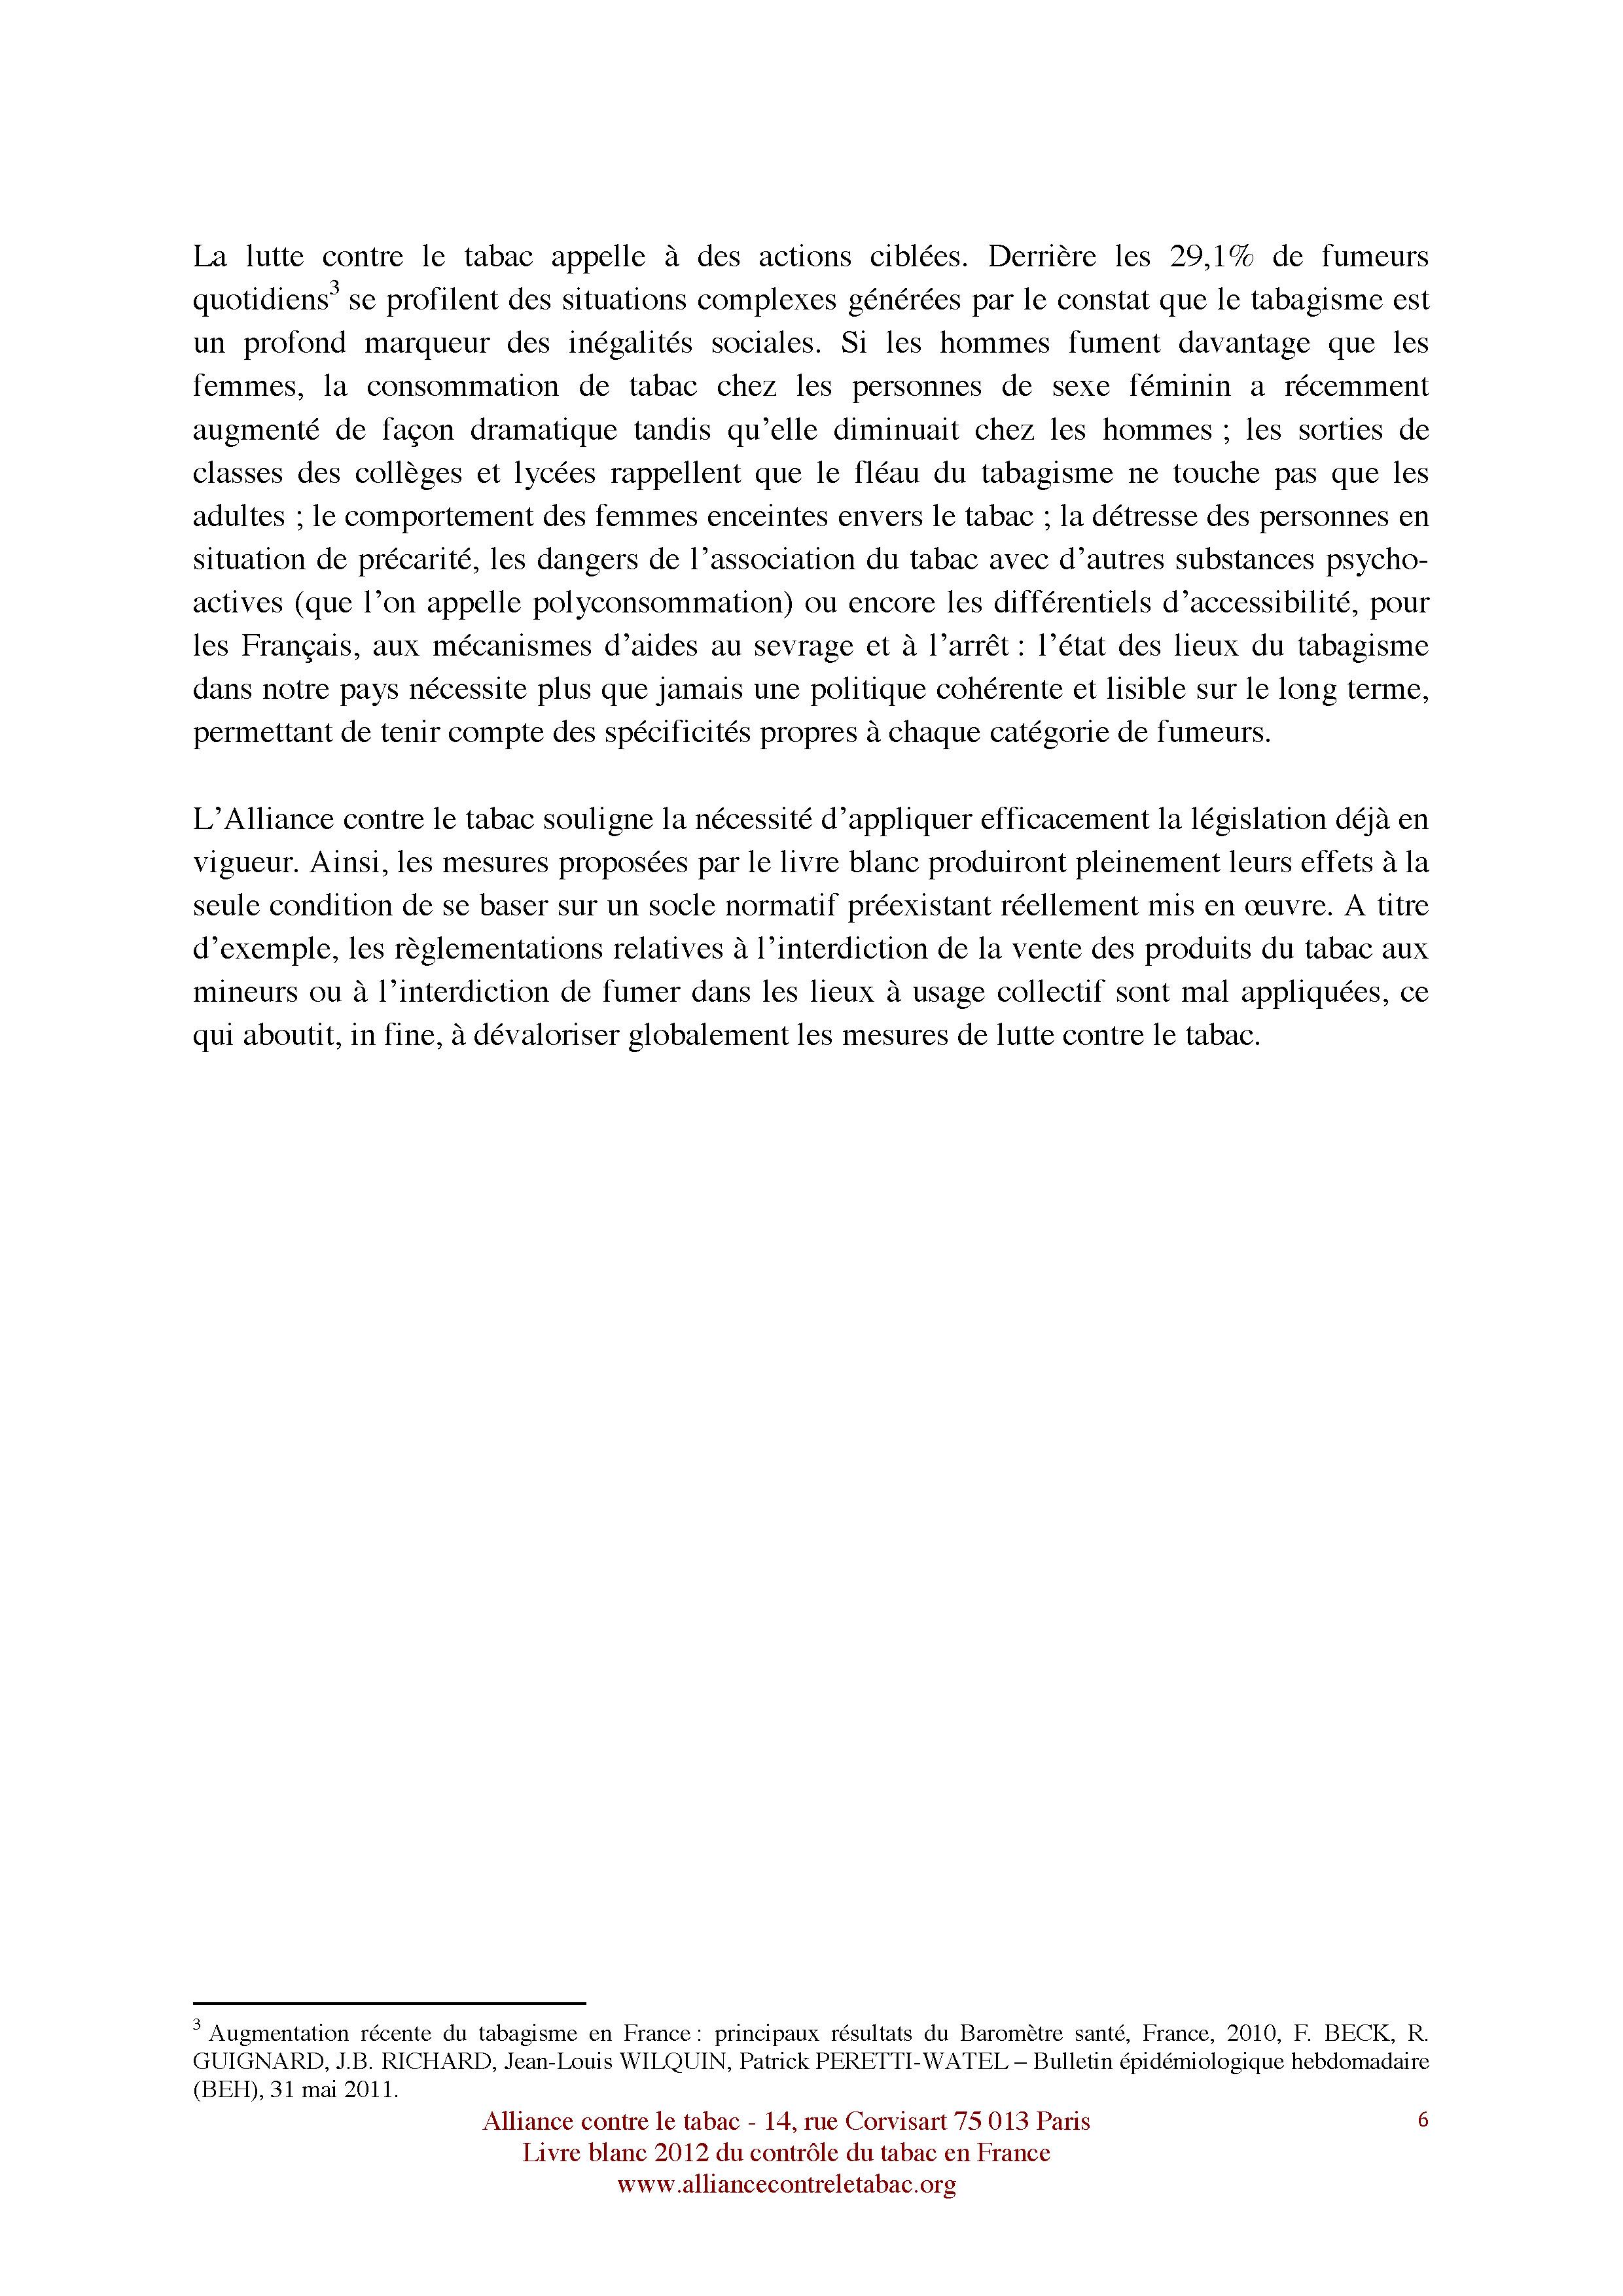 Alliance-dossier-presse_livre-blanc-22mars2012_Page_06.jpg